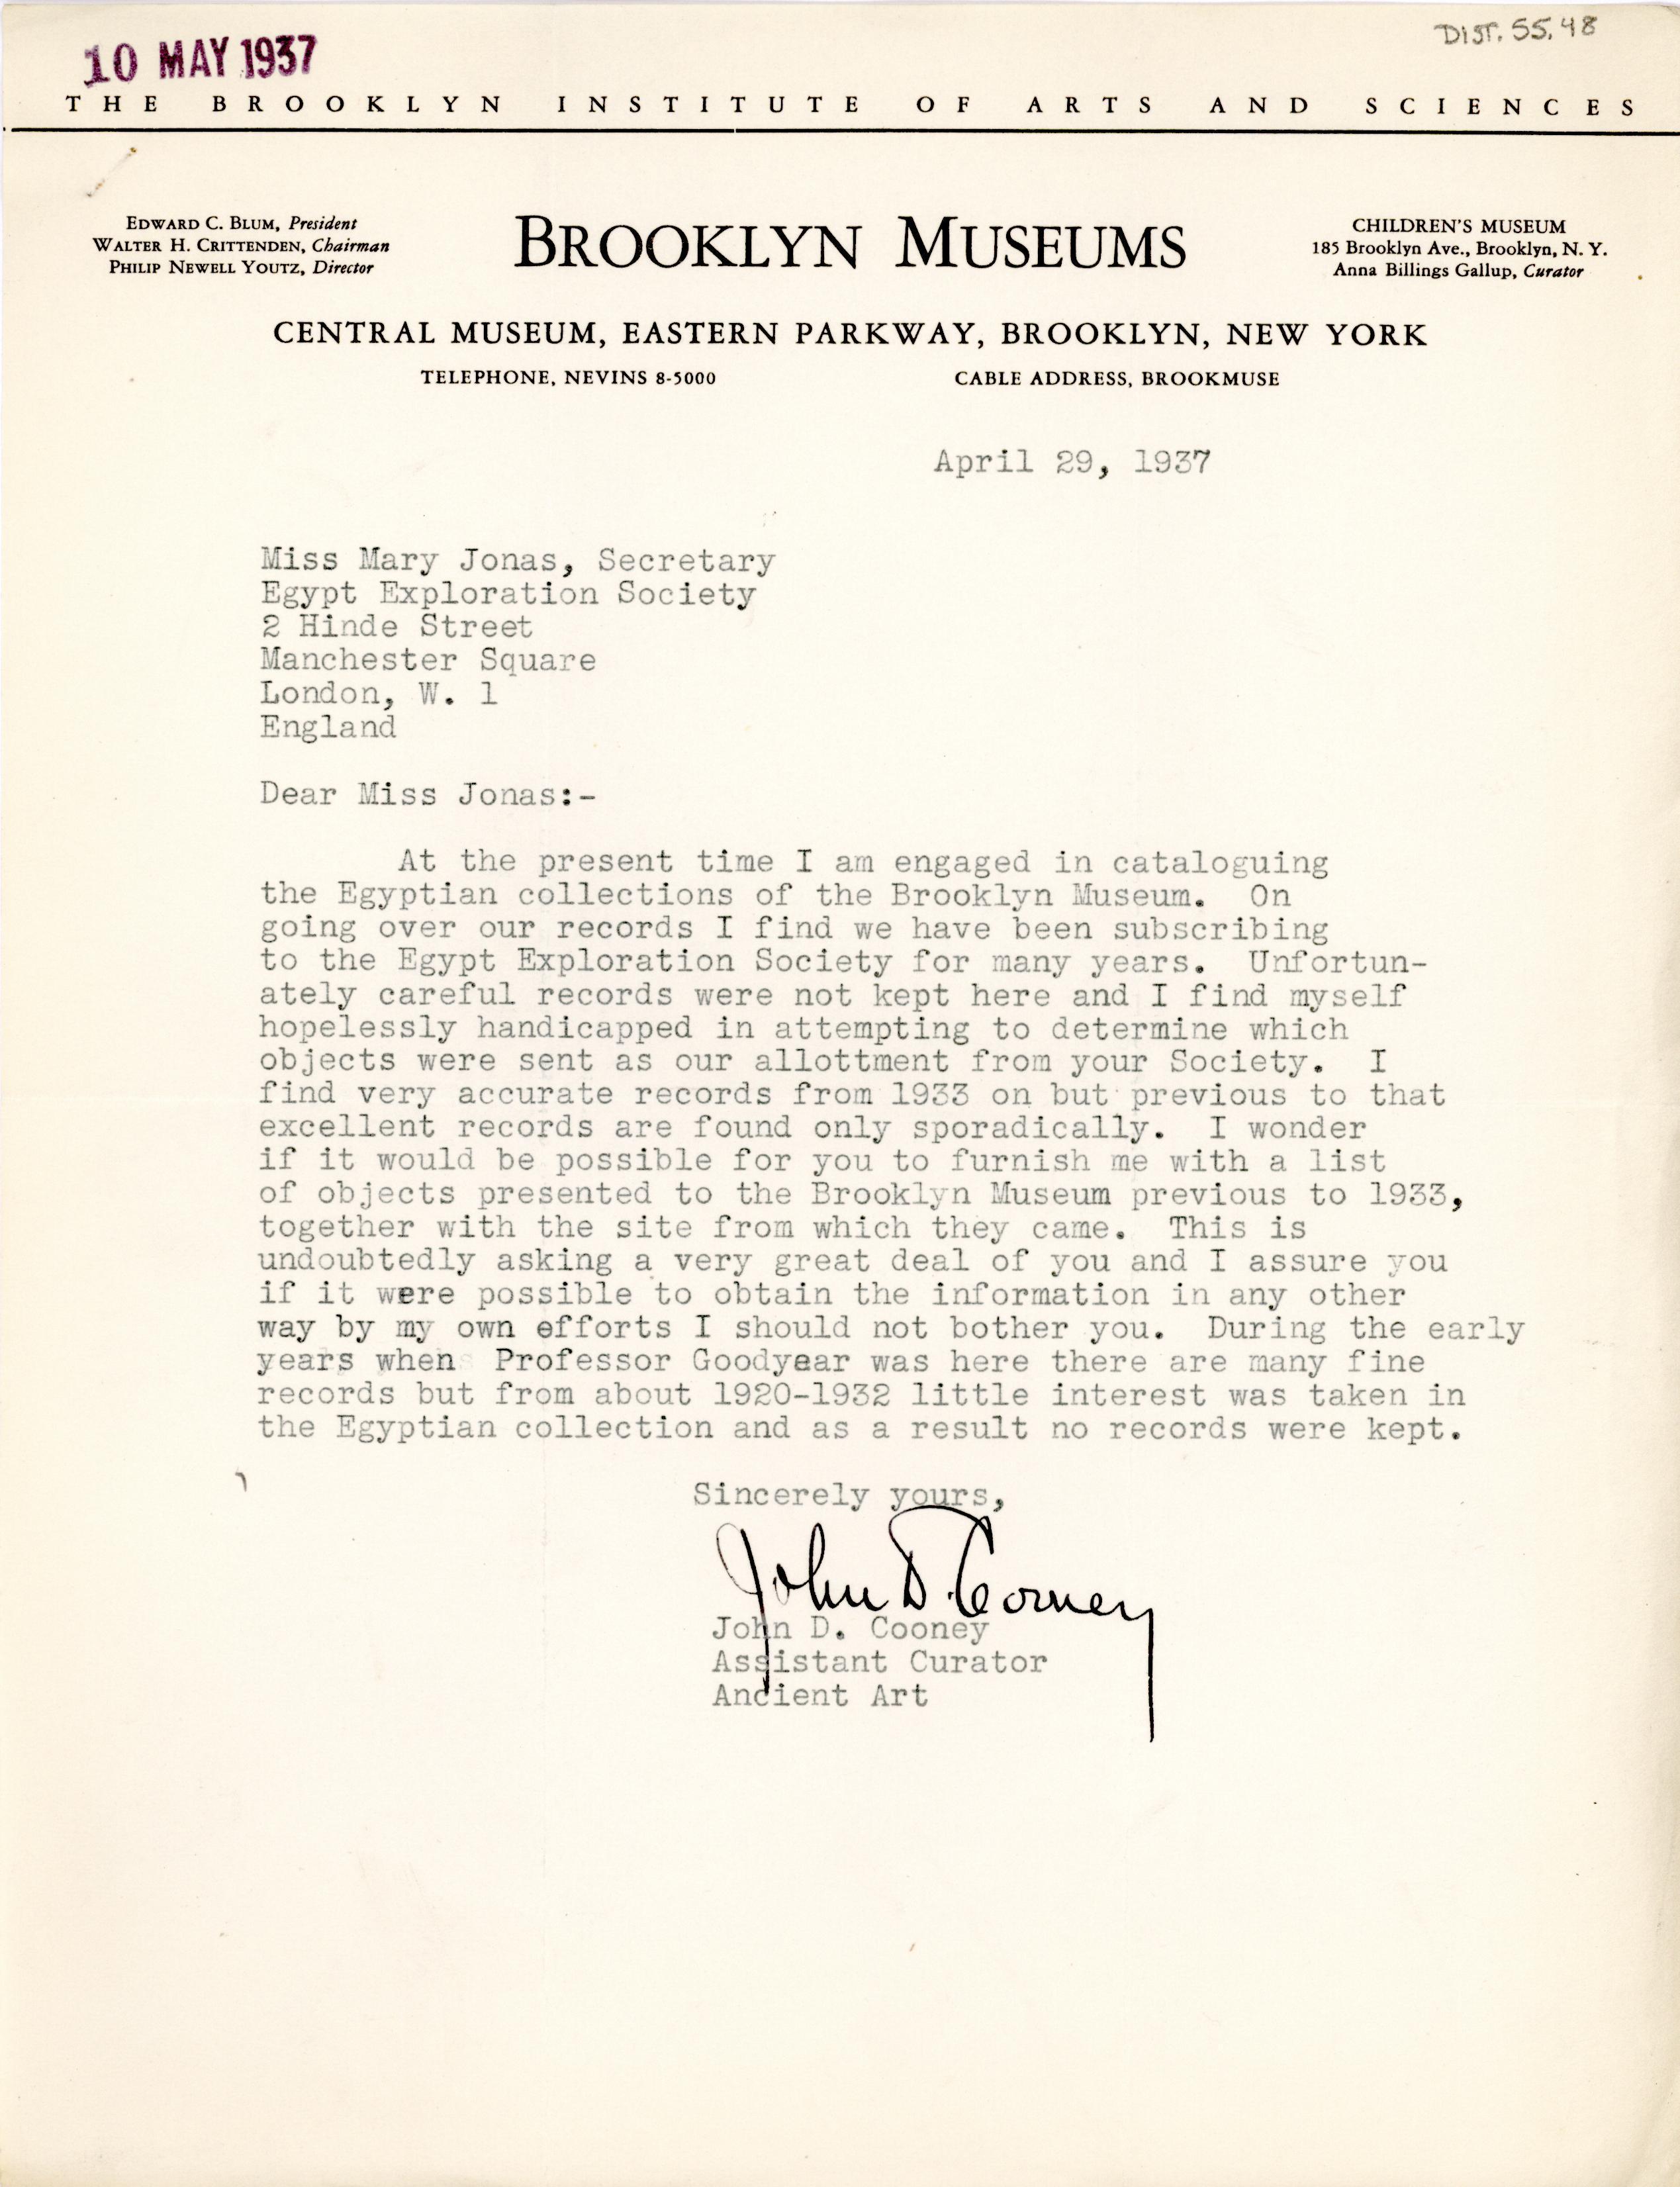 1931-44 Brooklyn Museum DIST.55.48